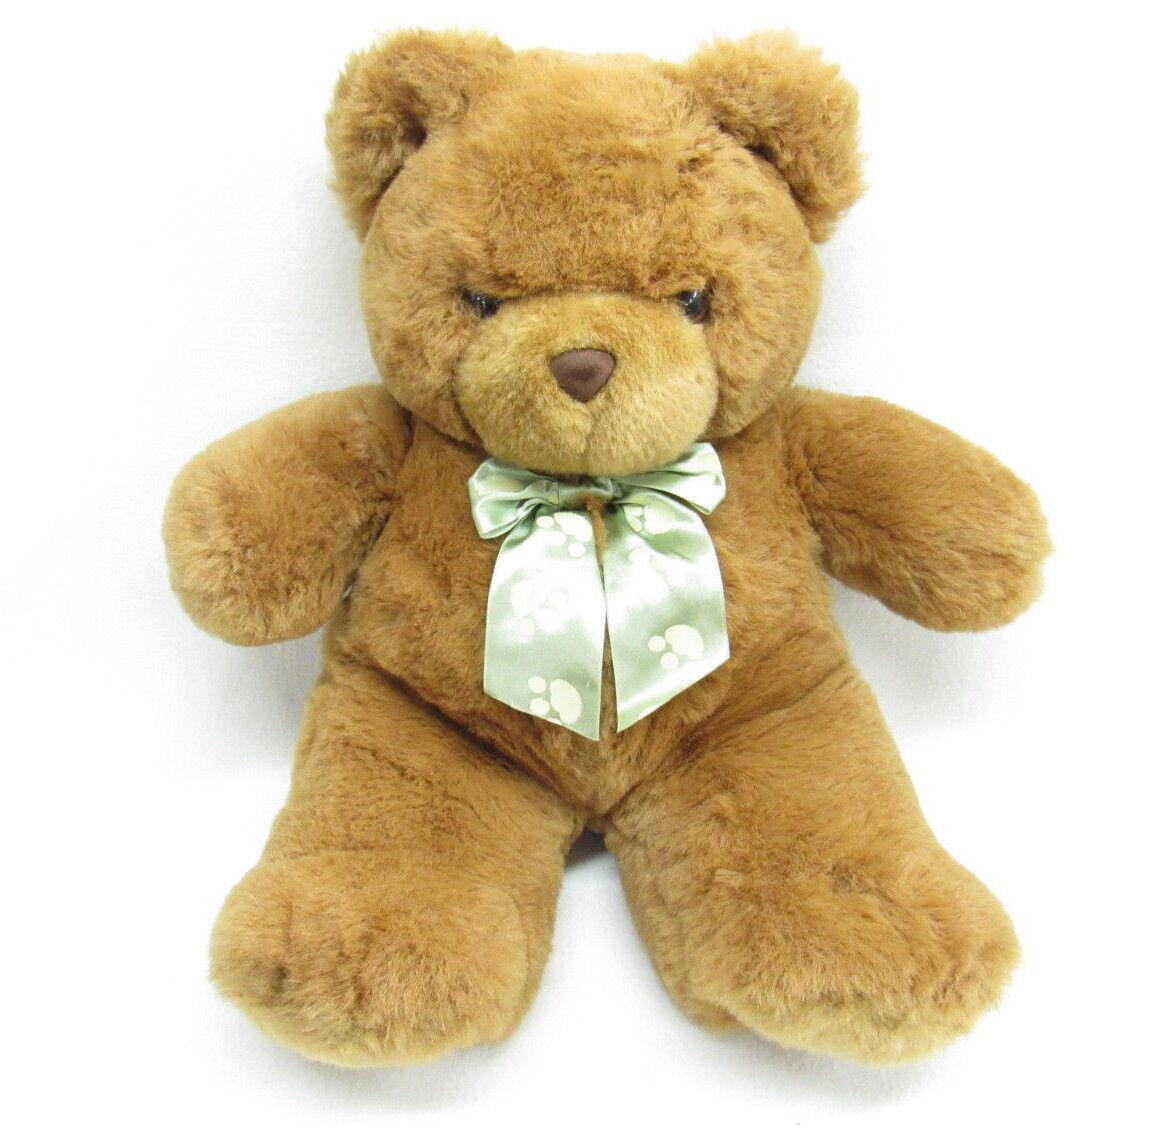 VTG MTY braun TEDDY BEAR PLUSH